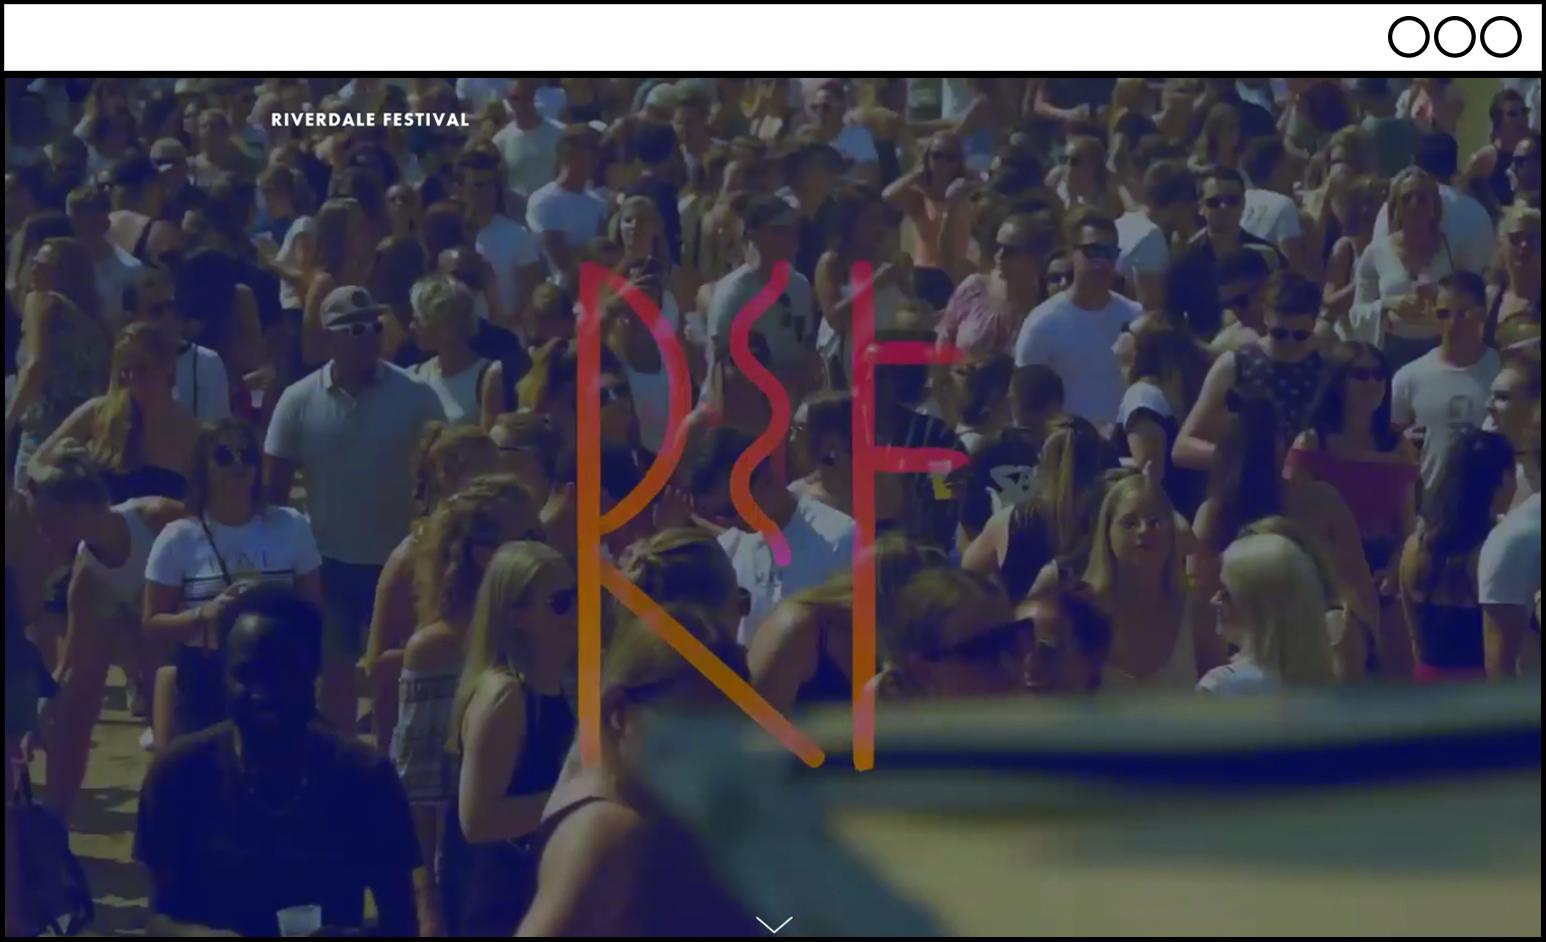 Riverdale site.jpg